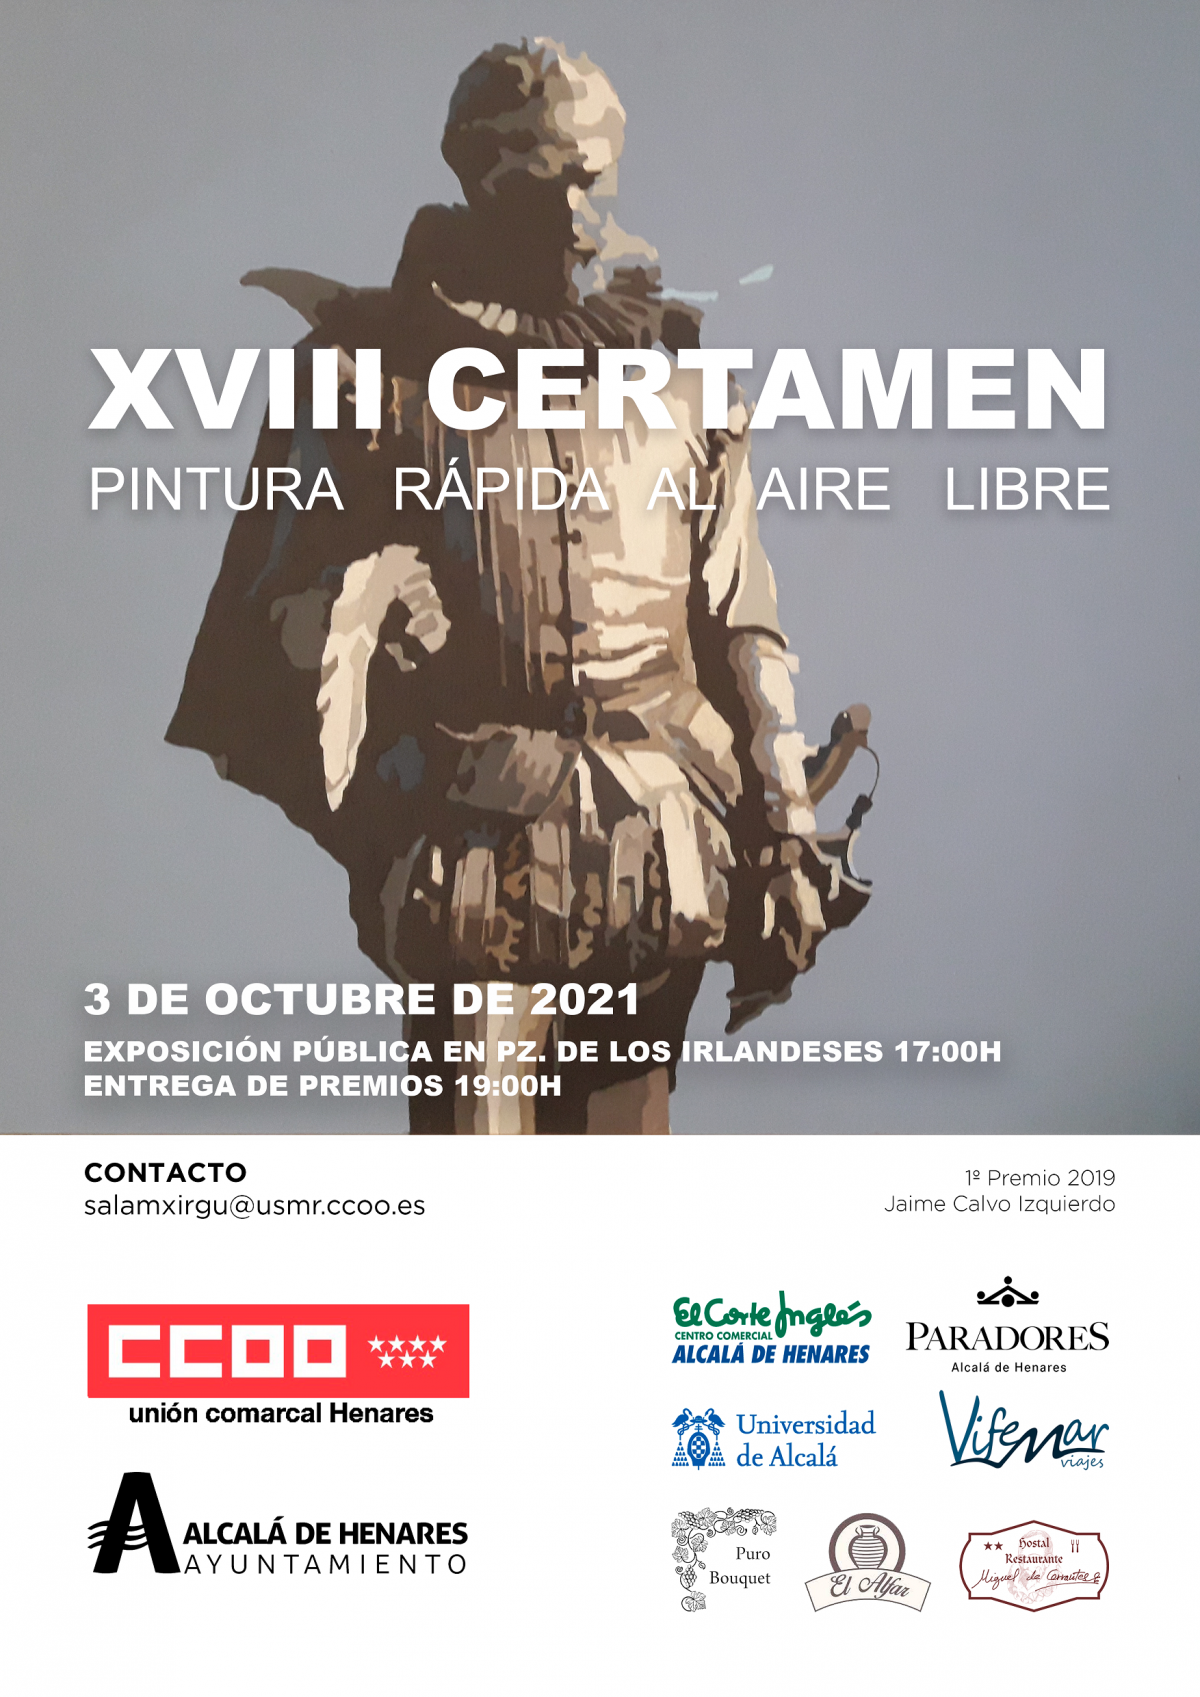 XVIII Certamen de pintura al aire libre de Alcalá de Henares